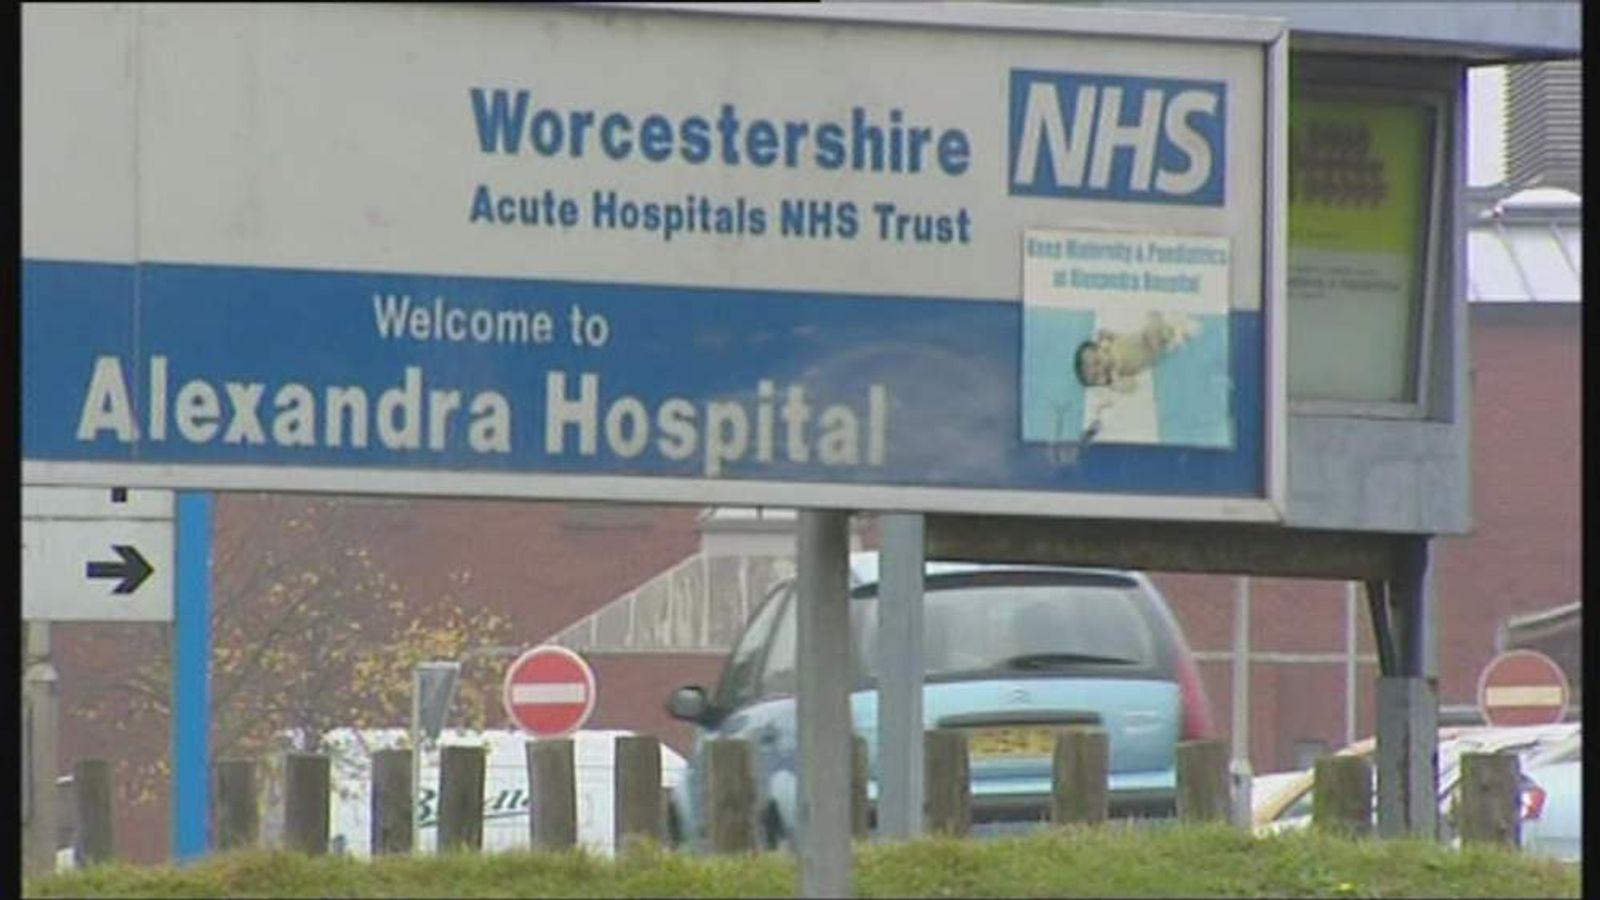 Alexandra Hospital